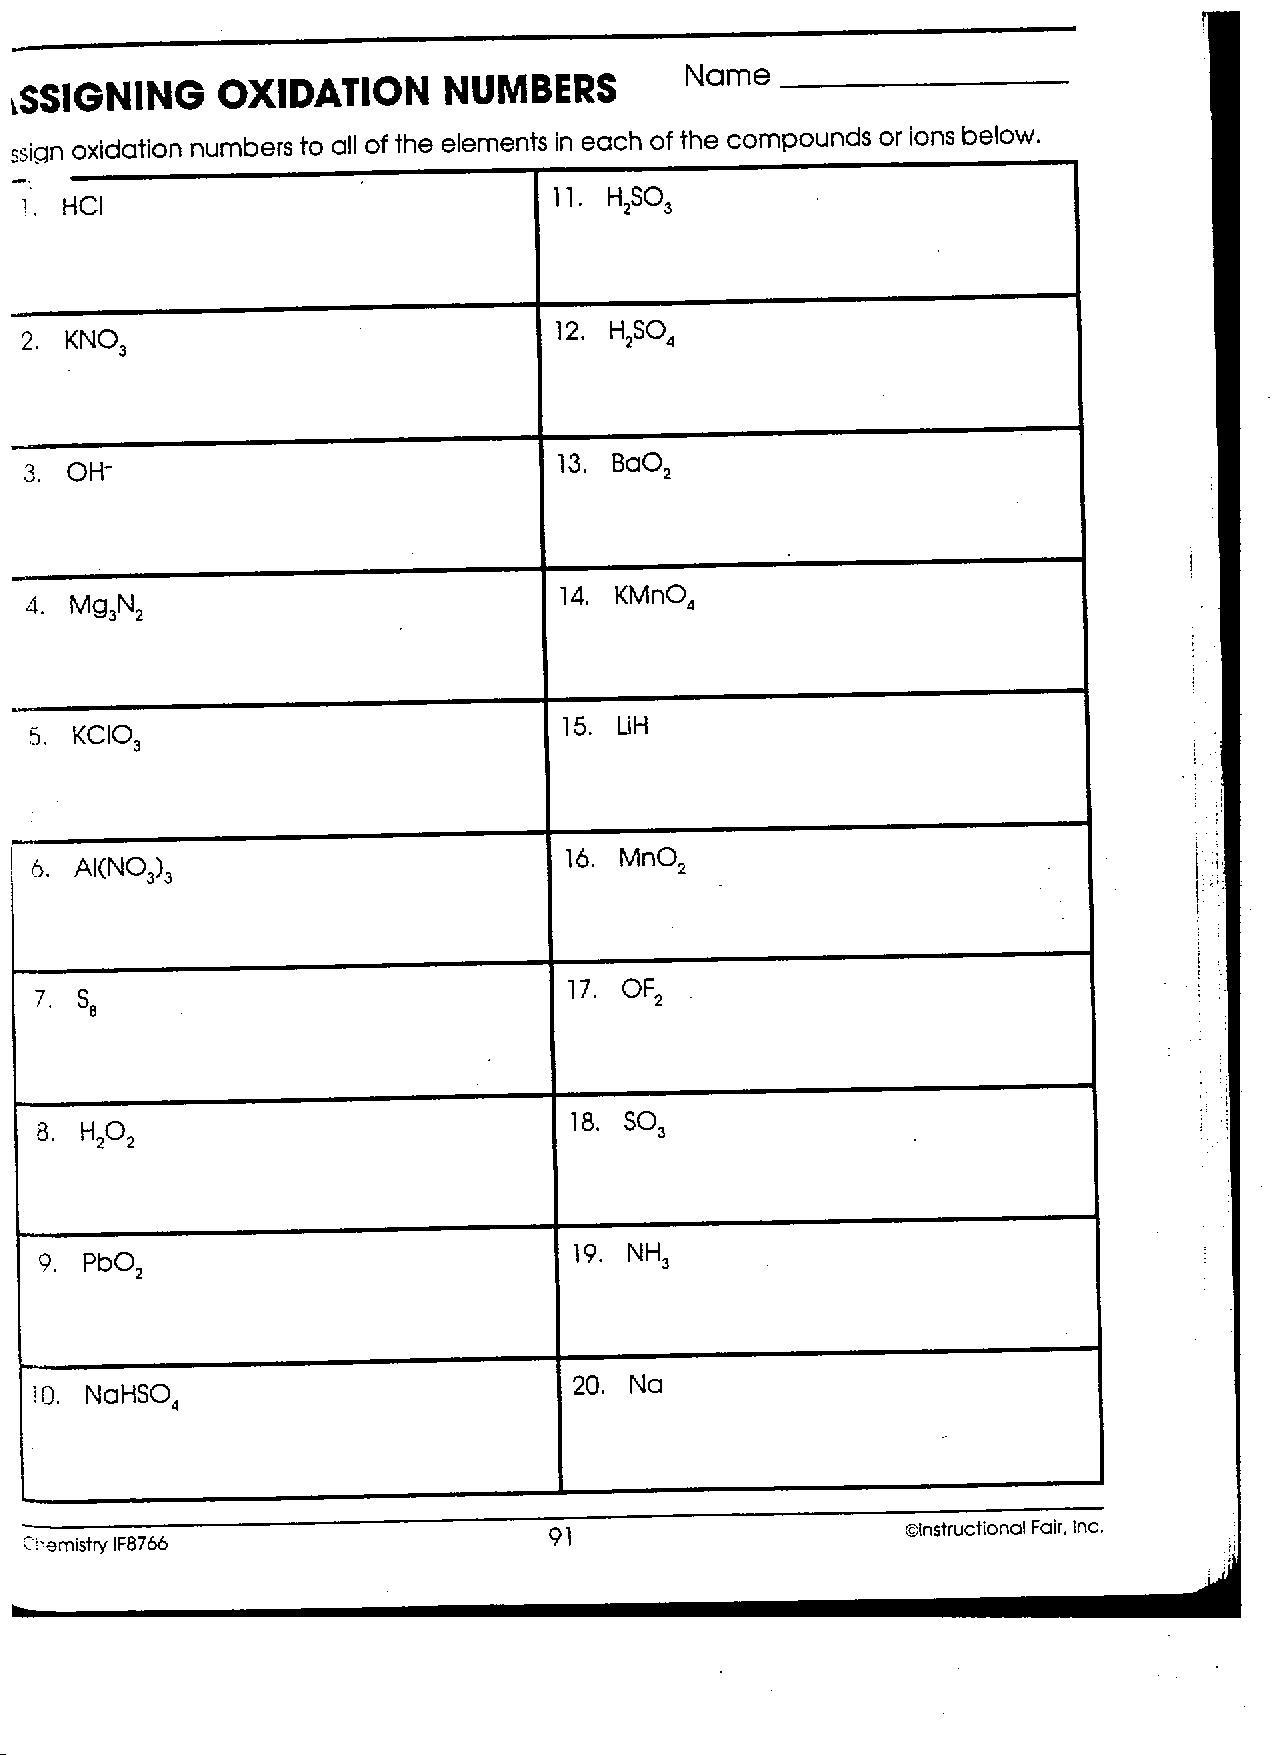 29 Oxidation Numbers Worksheet Answers Free Worksheet Spreadsheet [ 1755 x 1275 Pixel ]